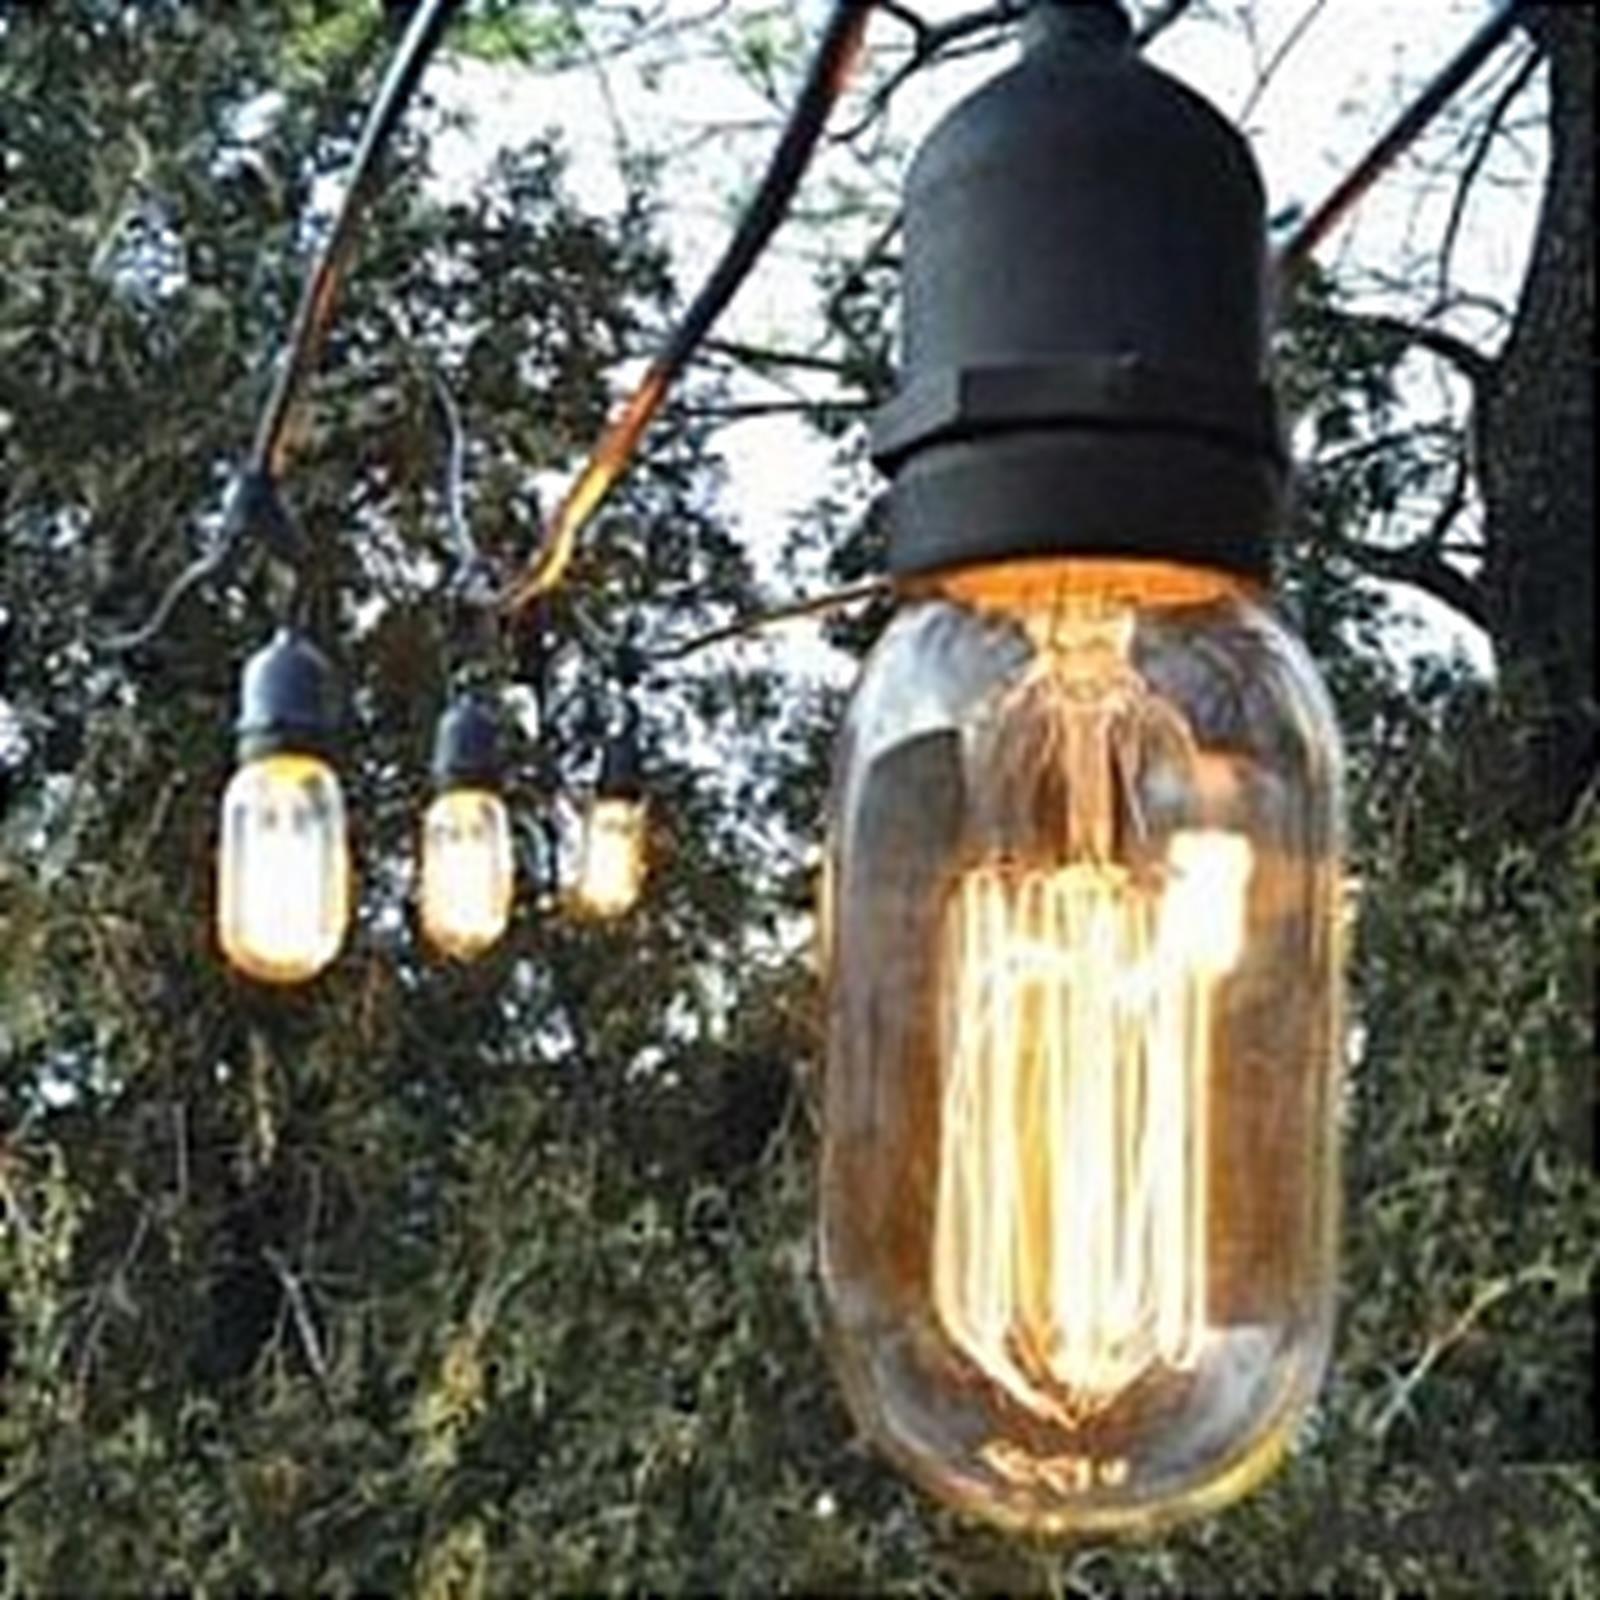 Edison Bulb Outdoor String Lights Bulbrite string15e26 a19kt outdoor string light wvintage edison bulbrite string15e26 a19kt outdoor string light wvintage edison bulbs 48 workwithnaturefo